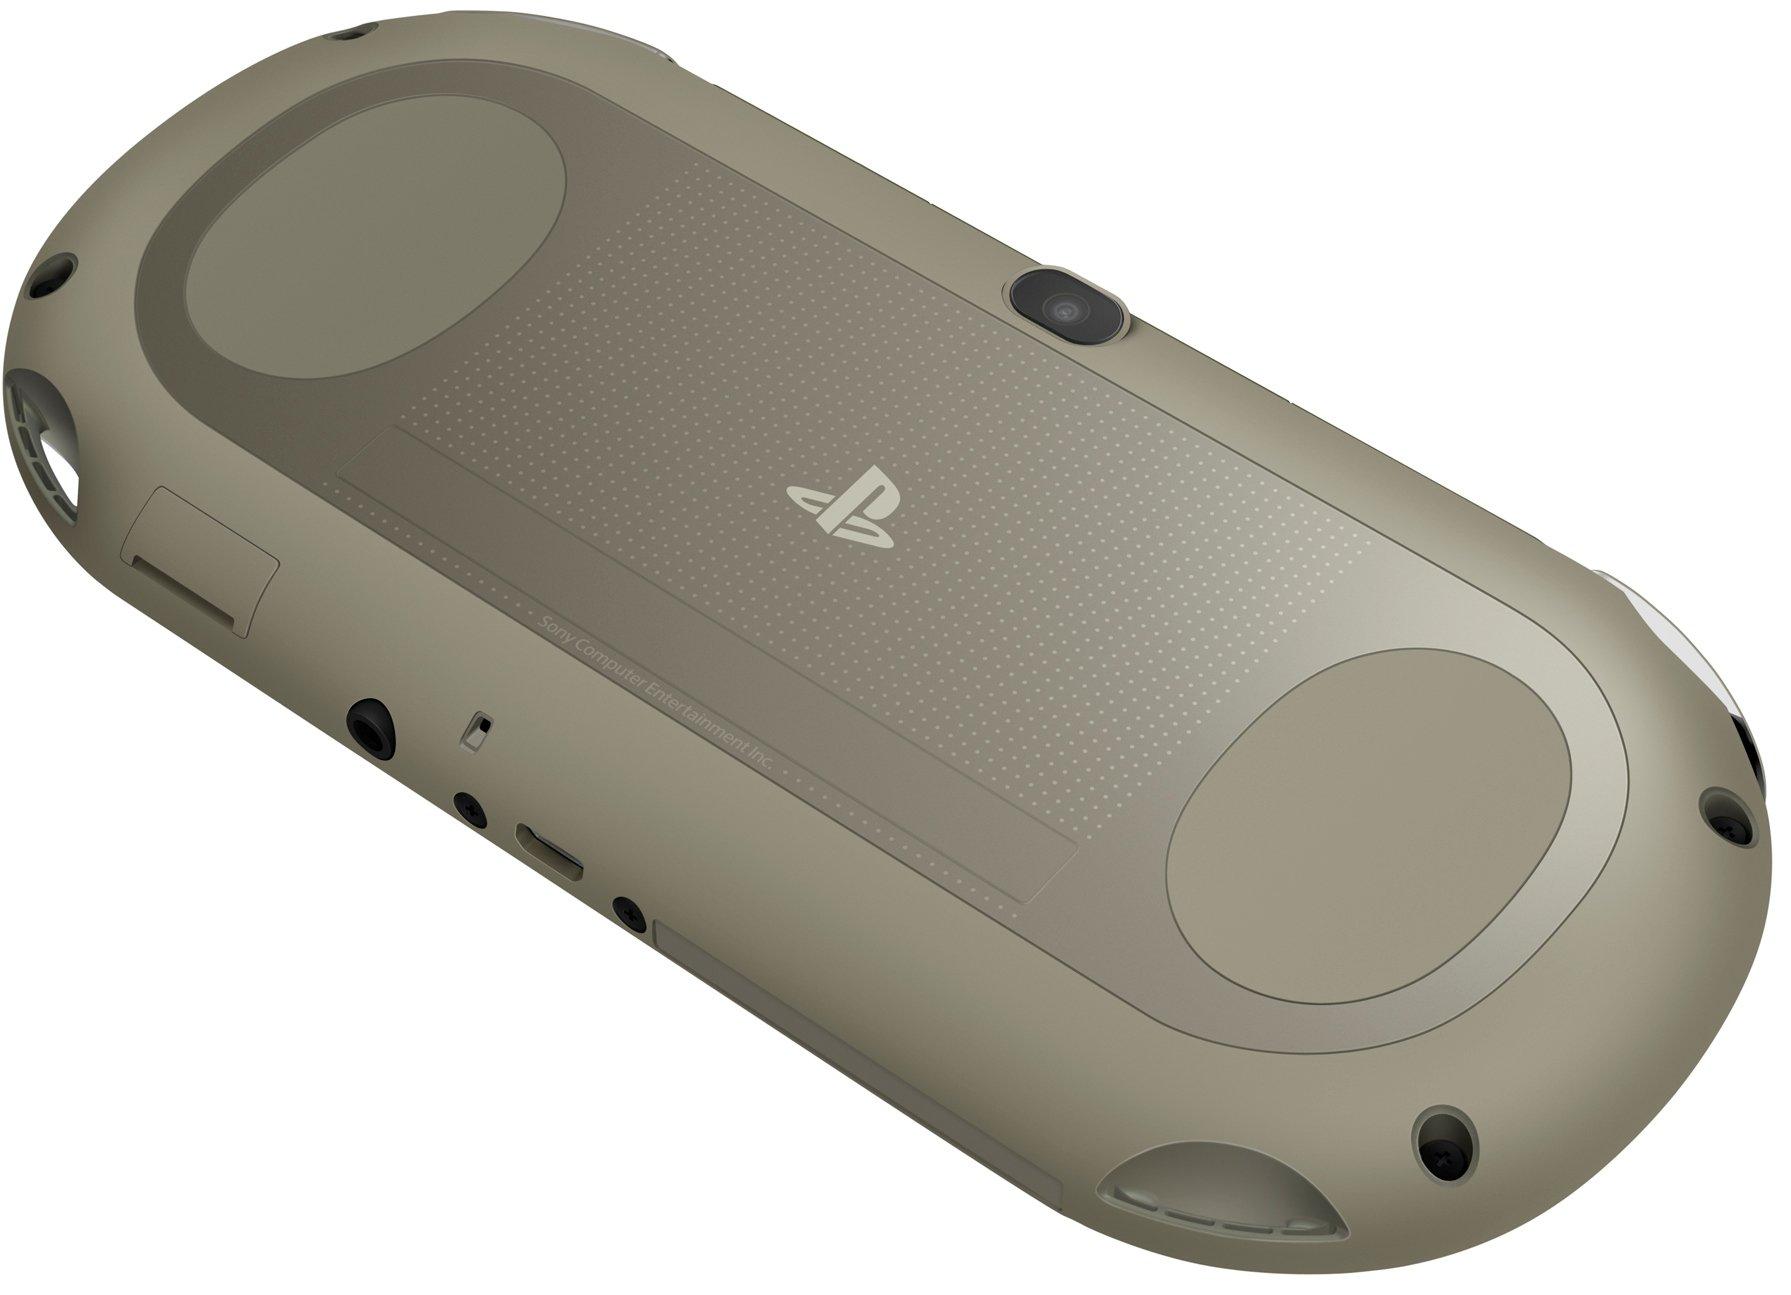 PlayStation Vita Wi-Fi Khaki/Black PCH-2000ZA16(Japan Import) by  (Image #3)